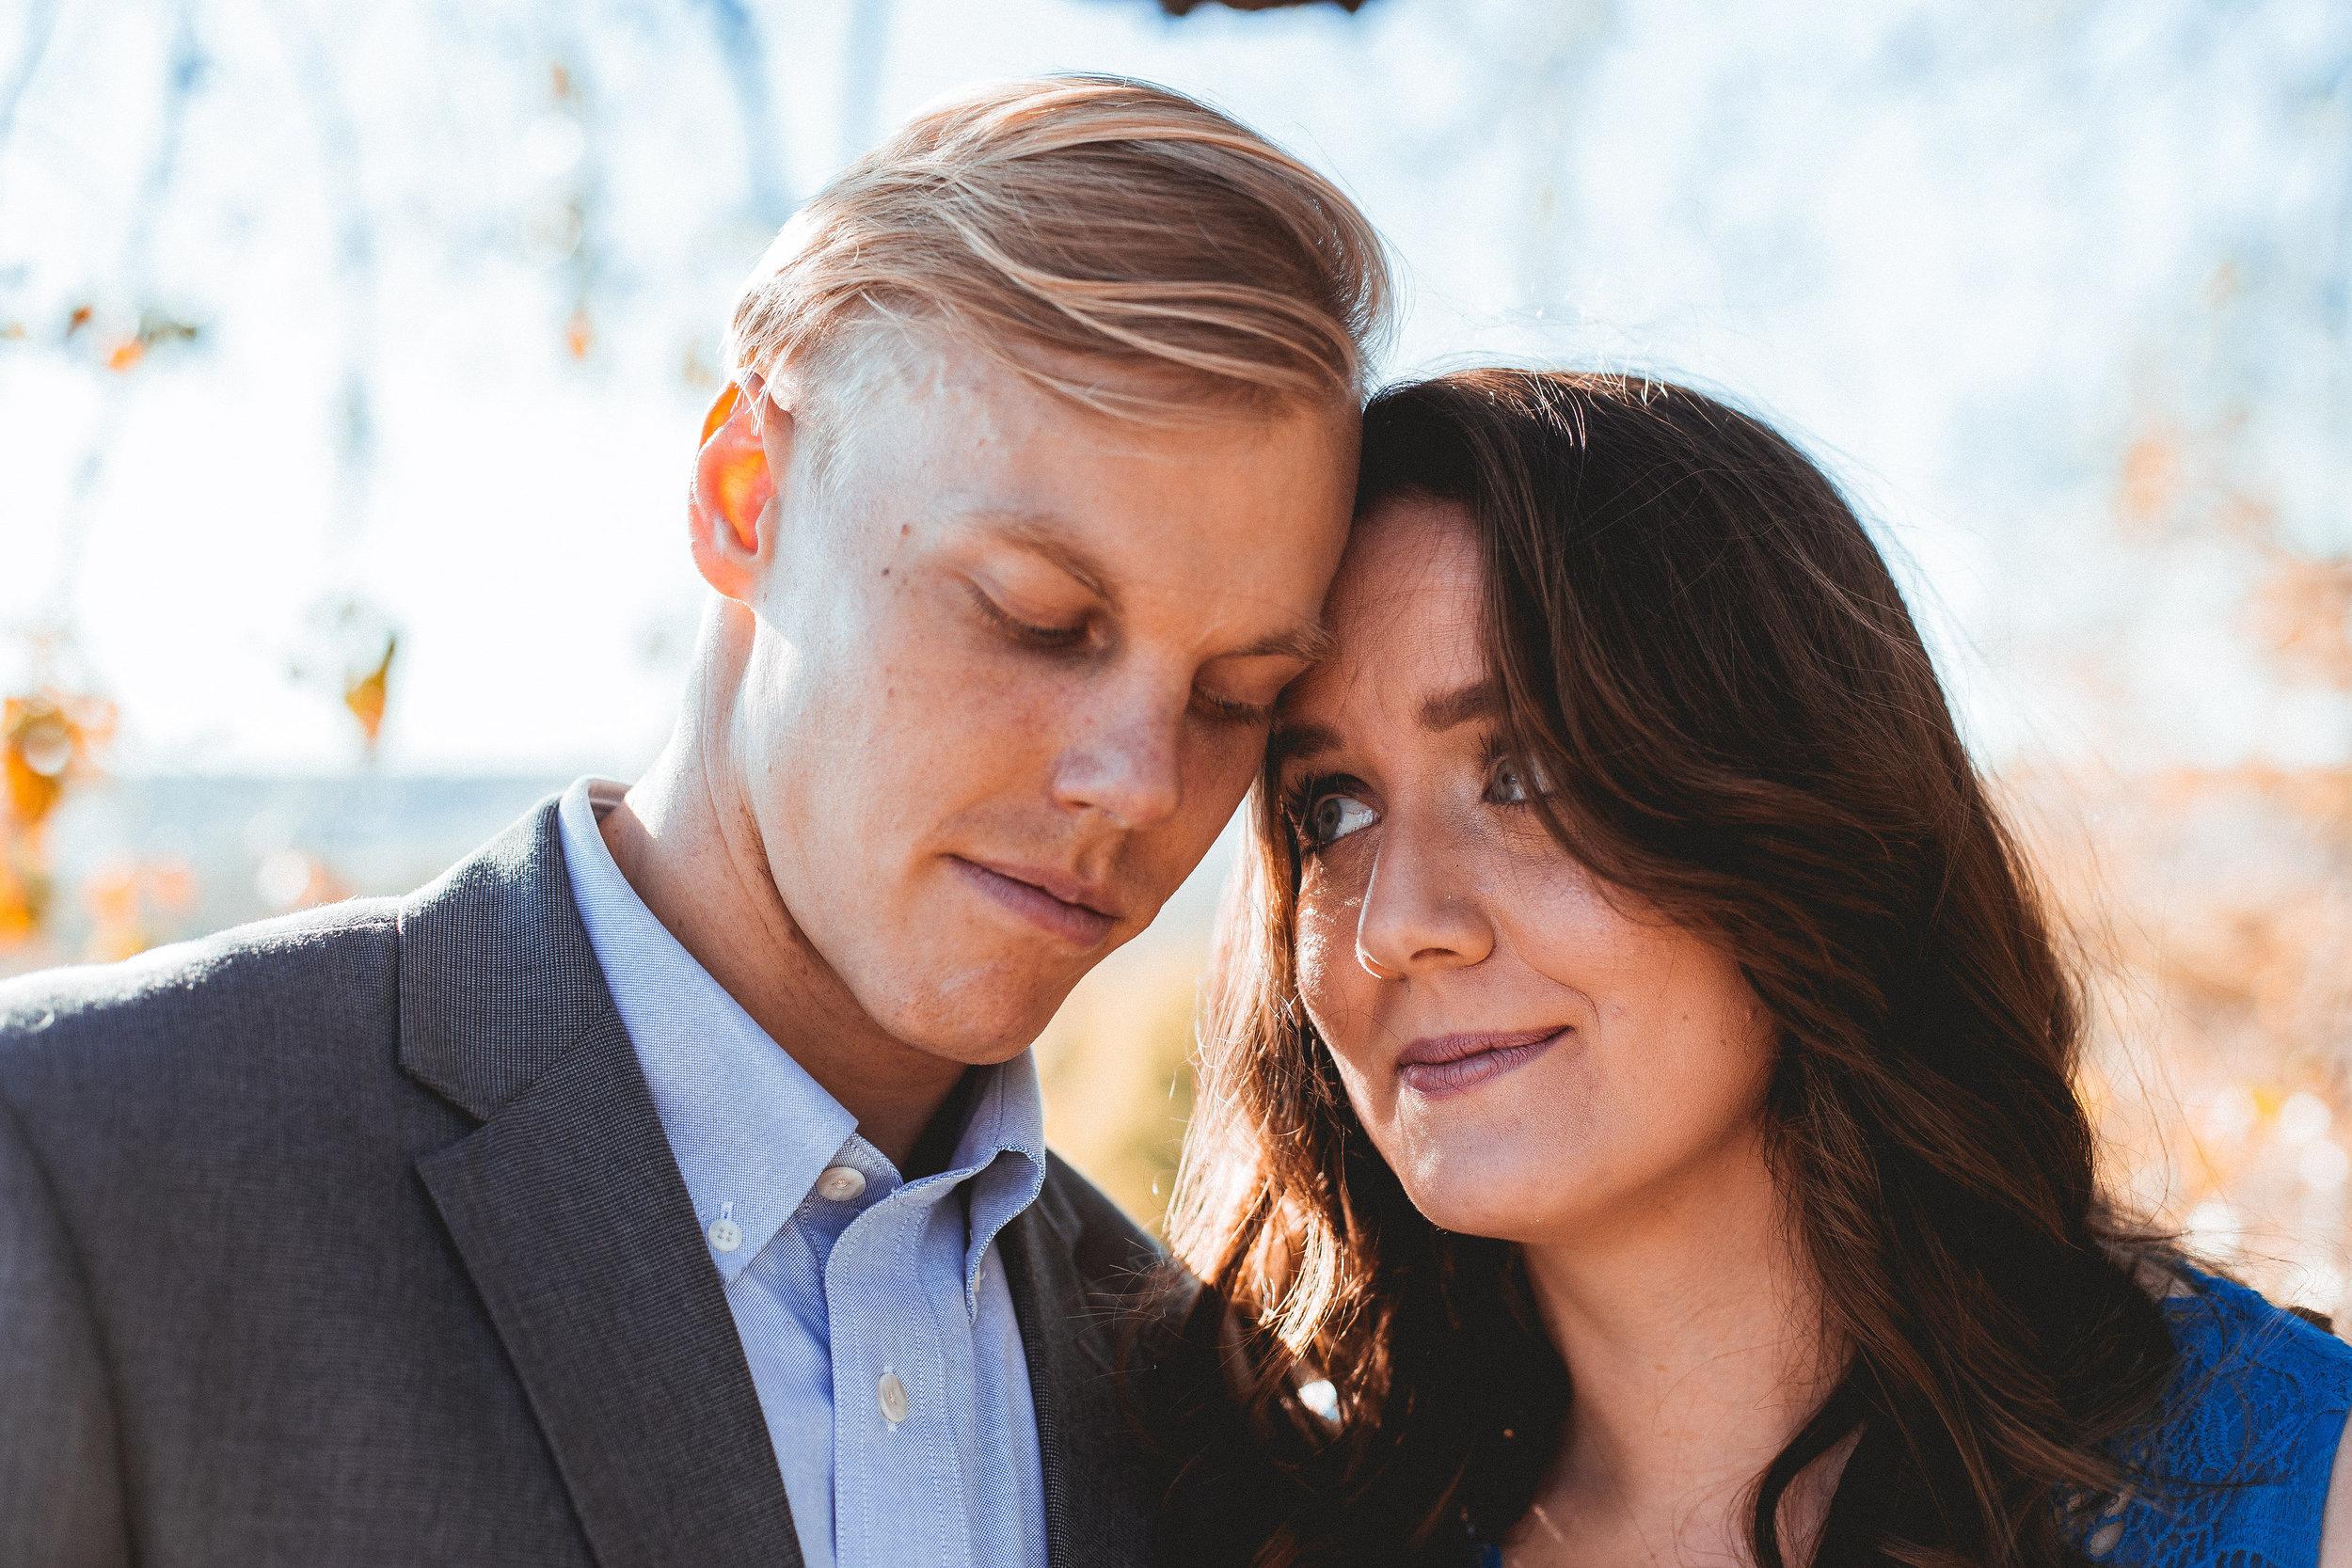 Lindsey&BertEngagementShoot11.5.16-103.jpg